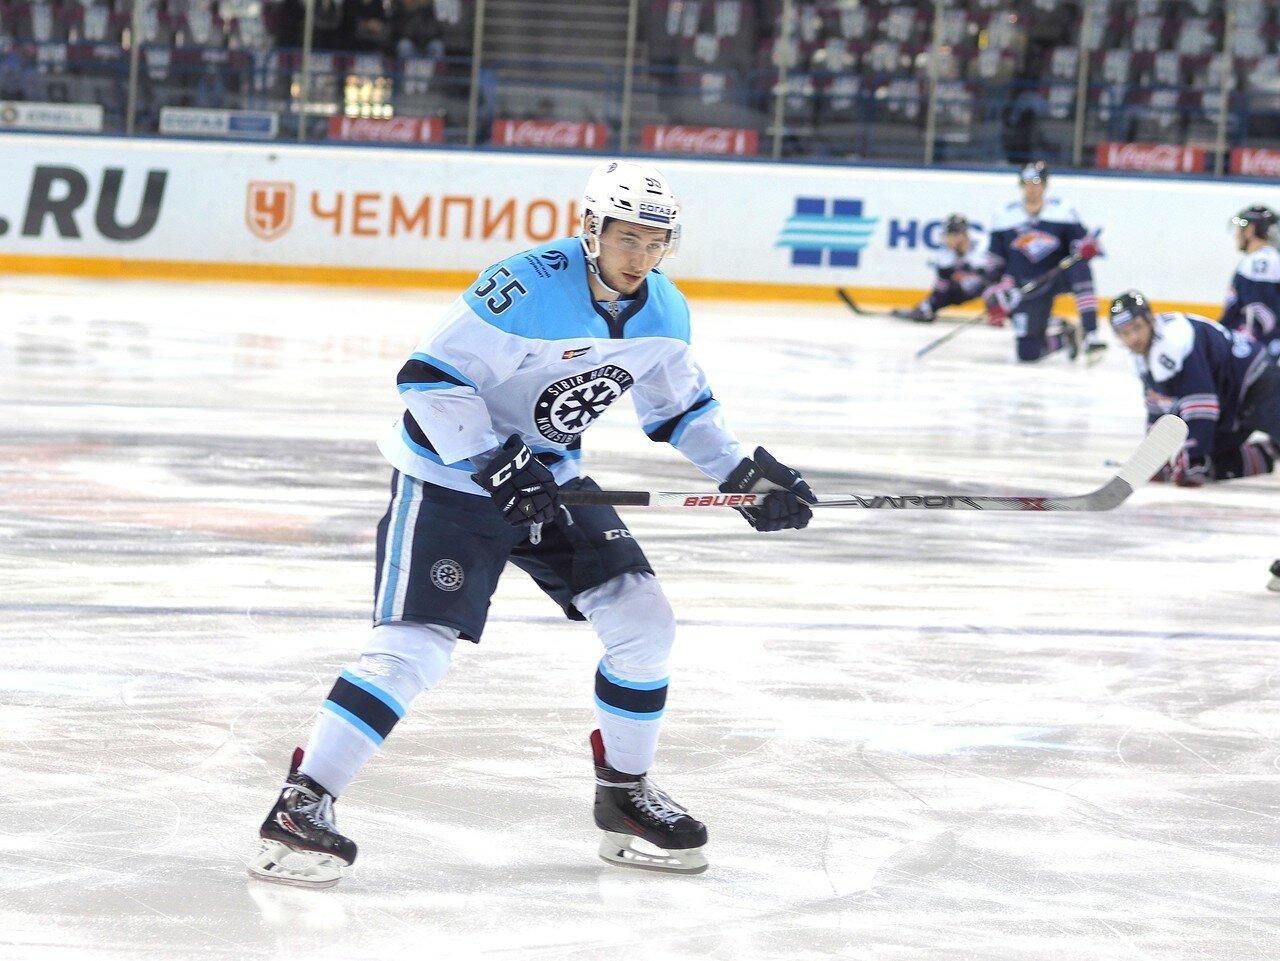 9Восток 1/2 плей-офф Металлург - Сибирь 08.03.2016